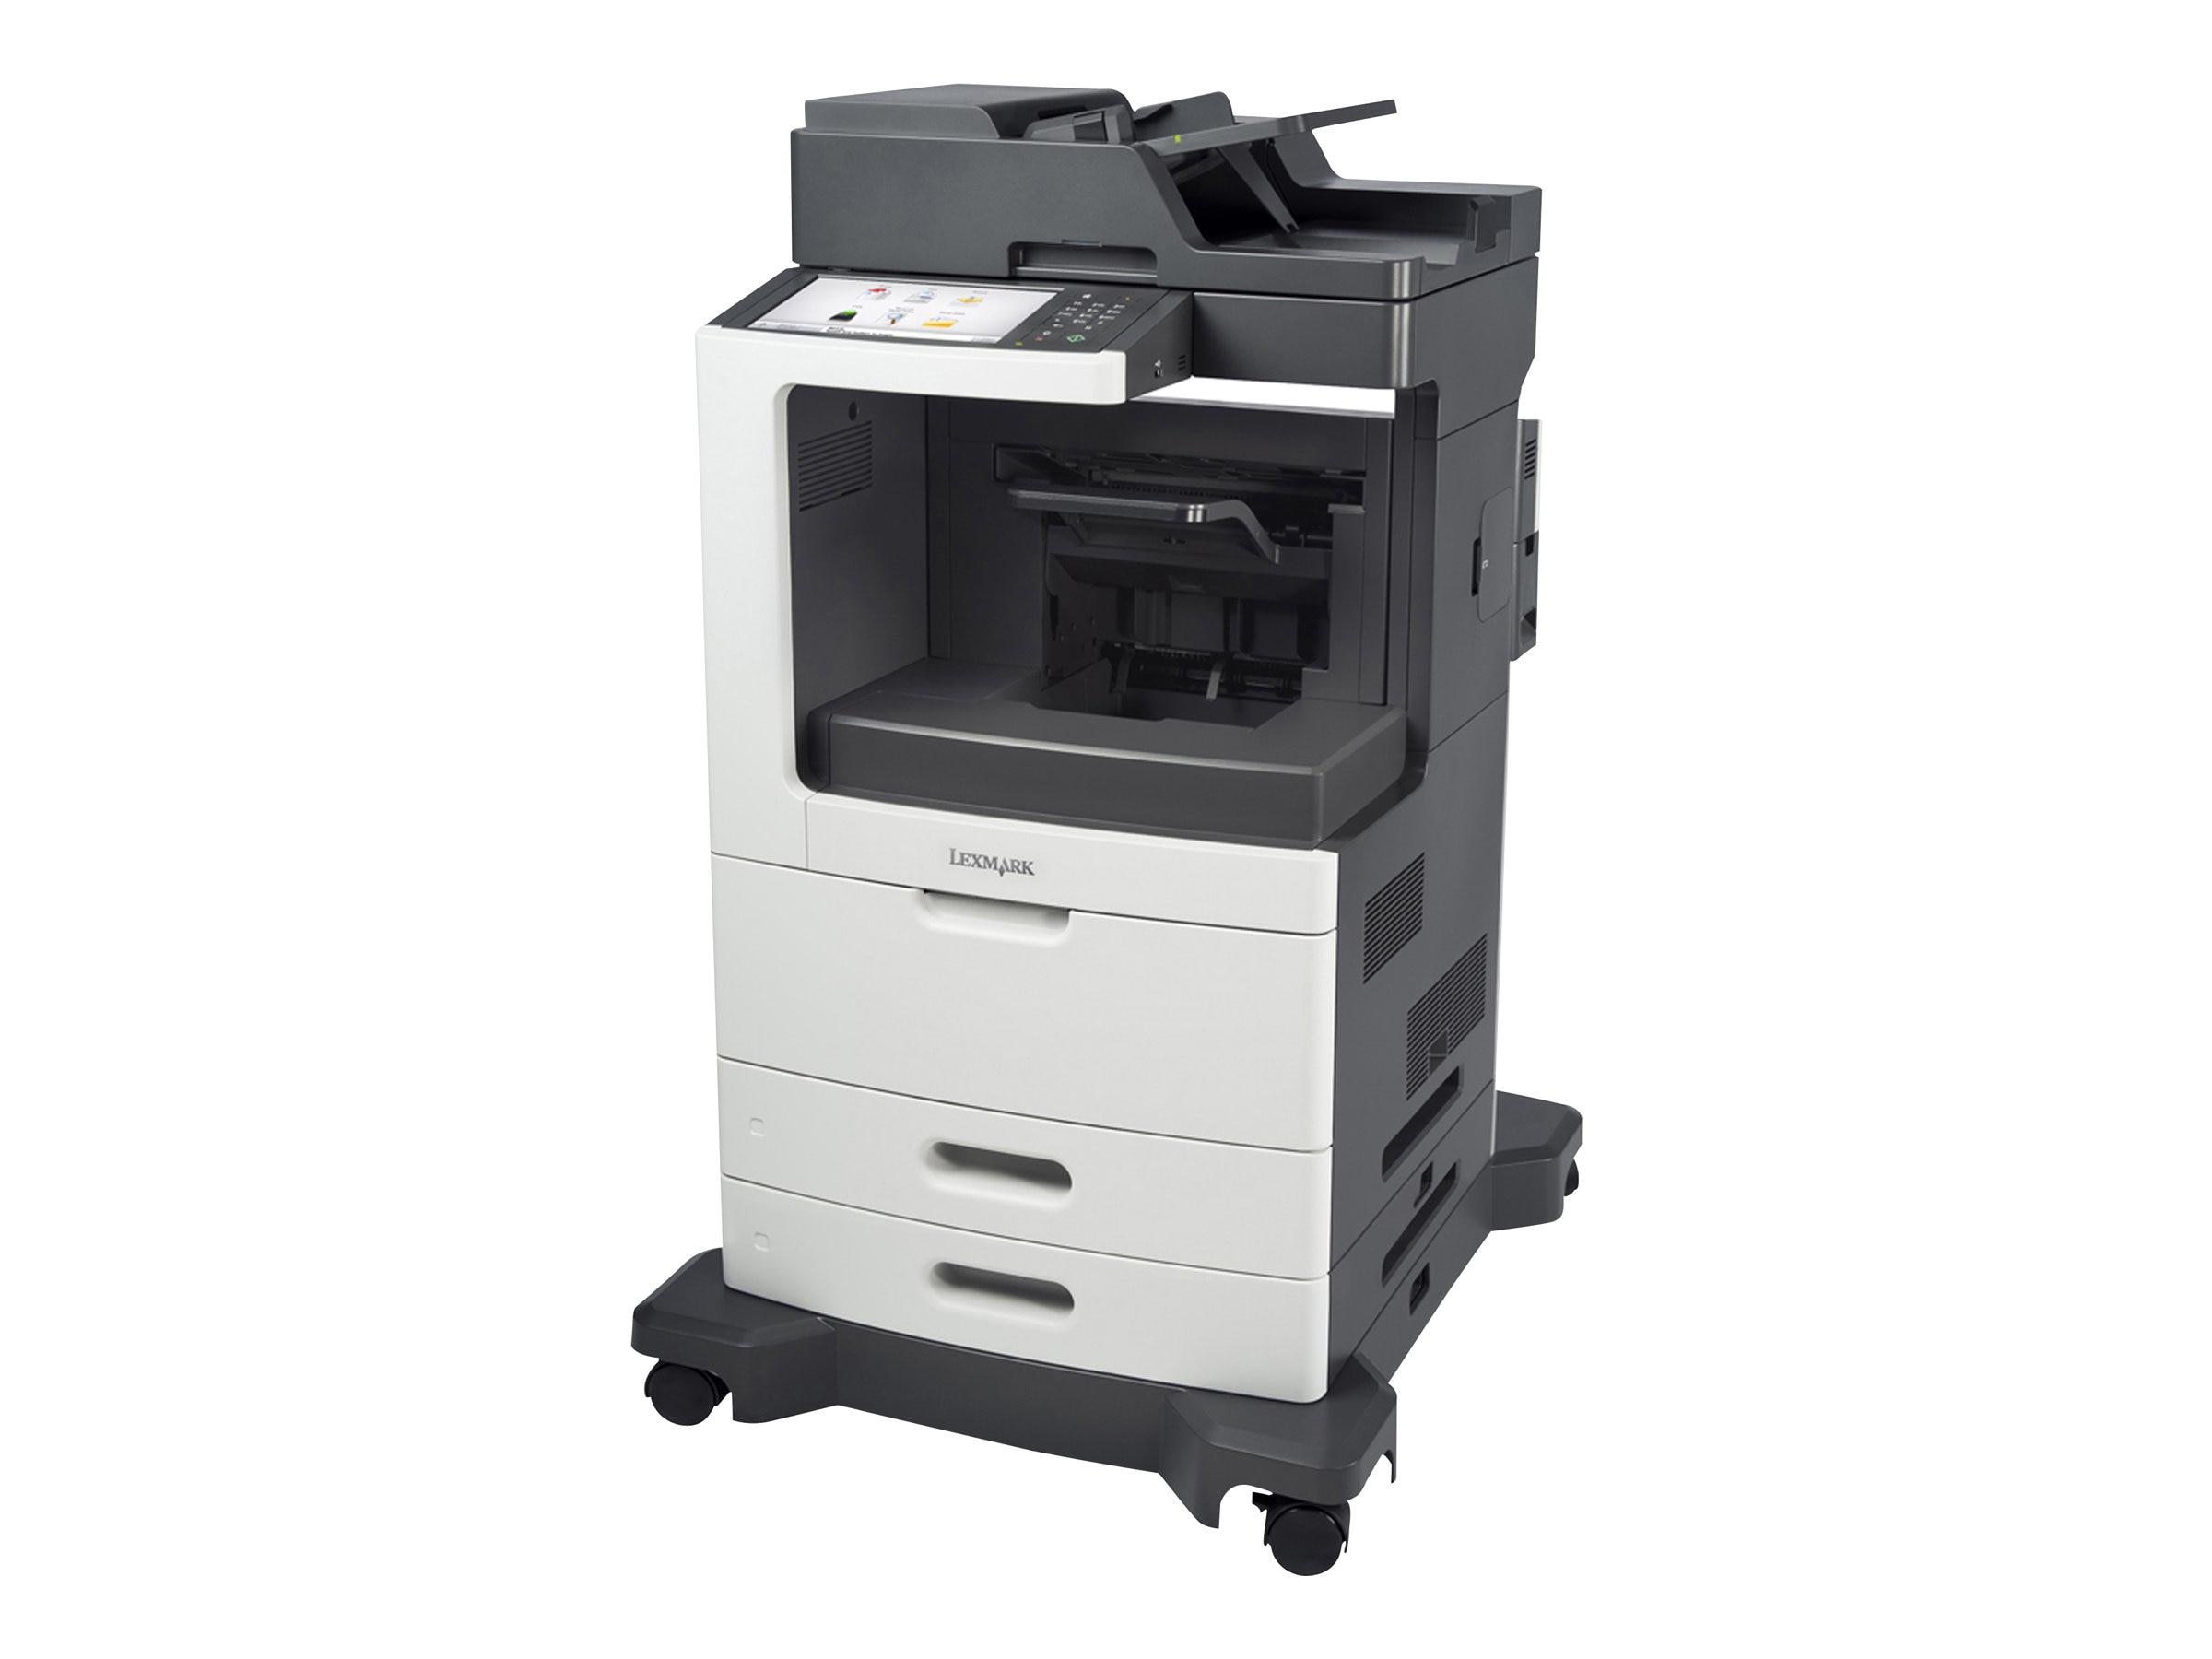 Lexmark MX810dfe Monochrome Laser Multifunction Printer